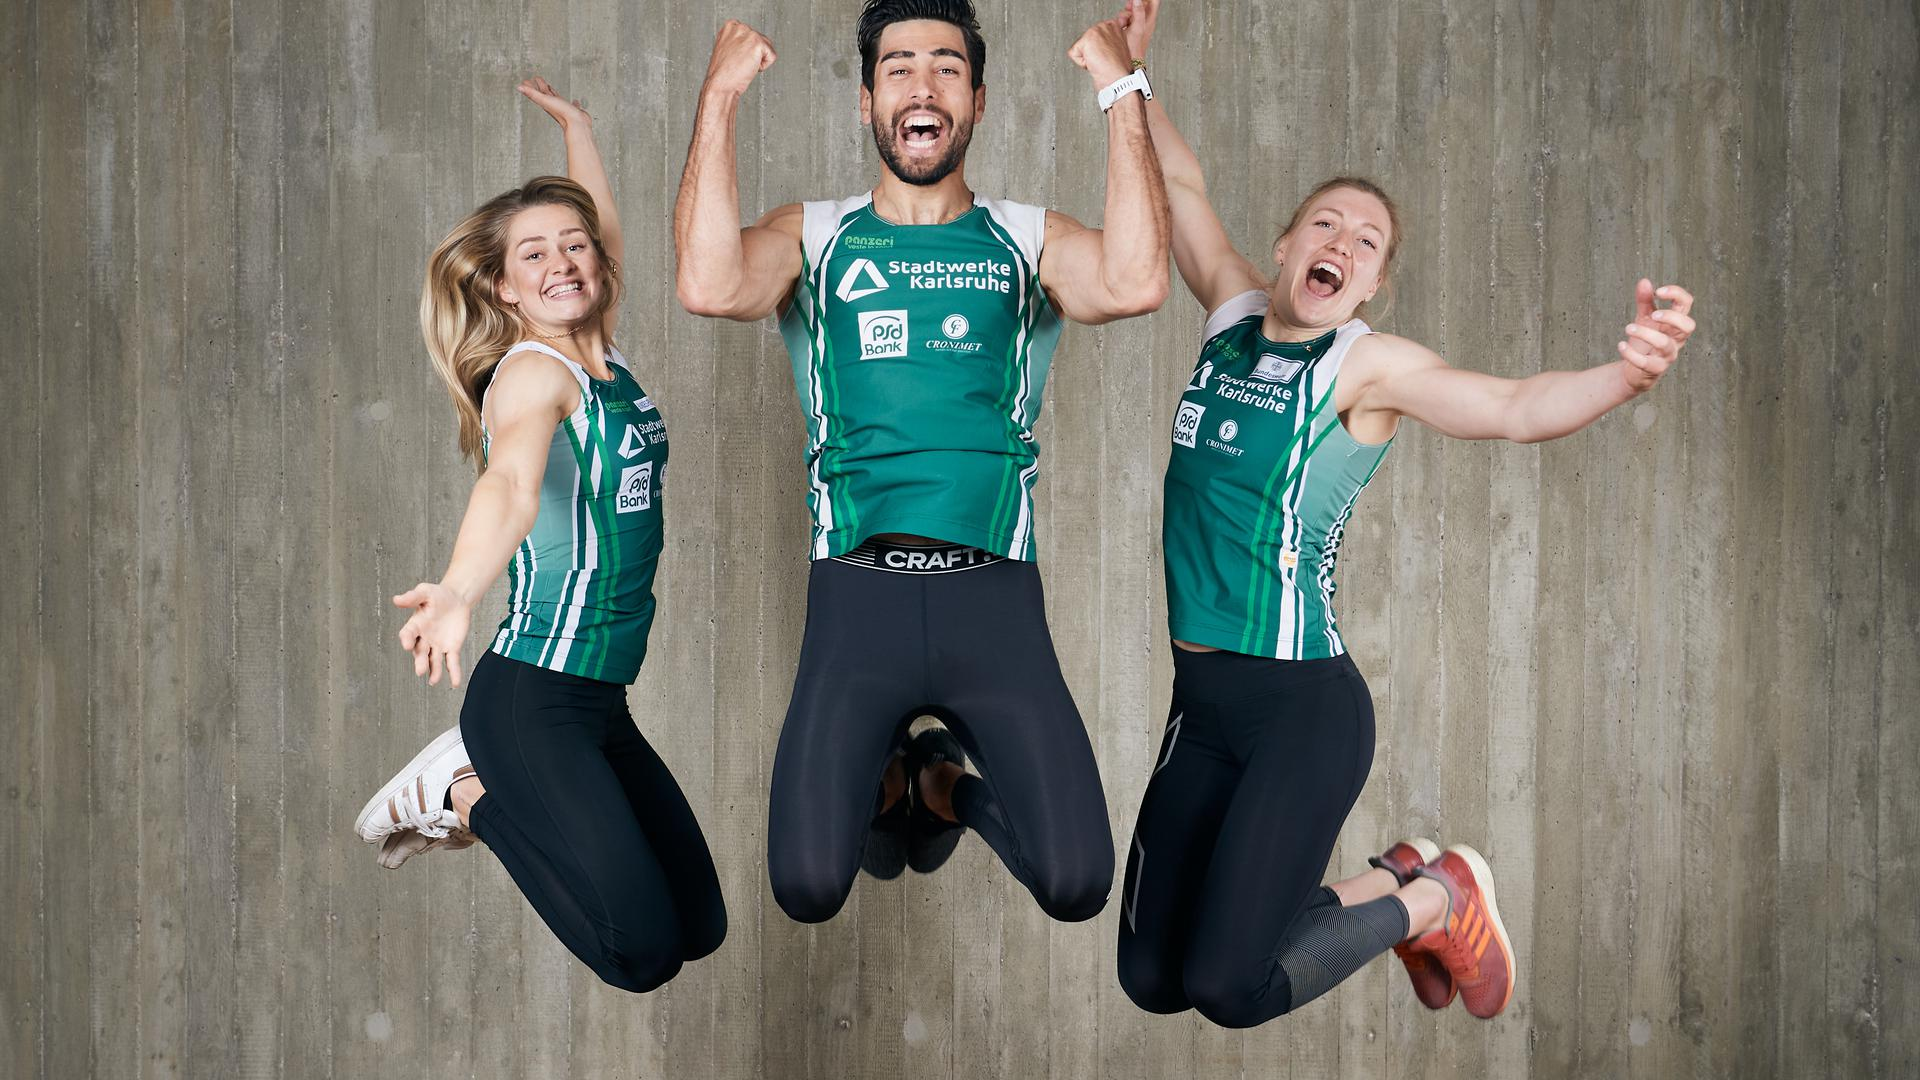 Sophie Koch, Saeid Fazloula, Sarah Bruessler, (von links).  GES/ Kanu-Rennsport/ Rheinbrueder Karlsruhe, 13.04.2021